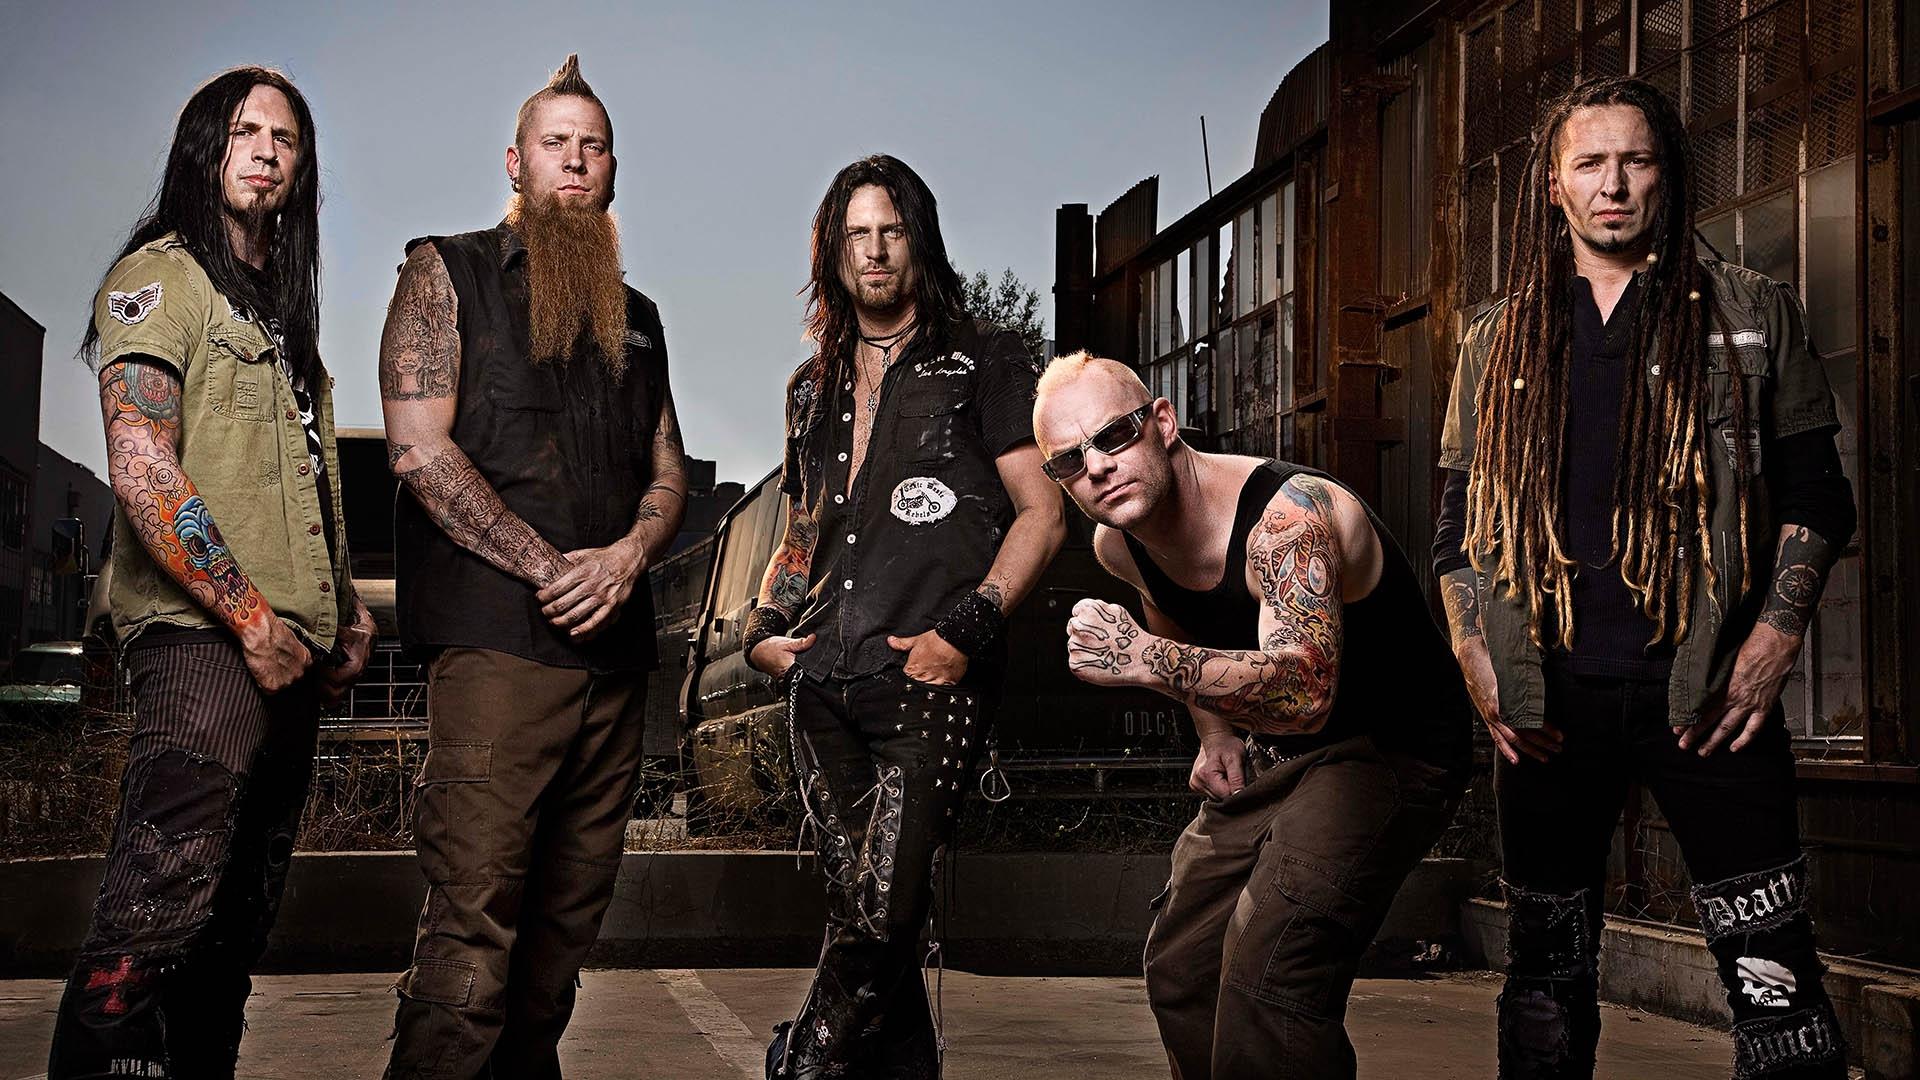 Musical Instrument Tattoo Musician Dreadlocks Five Finger Death Punch Beard Darkness Plucked String Instruments Facial Hair